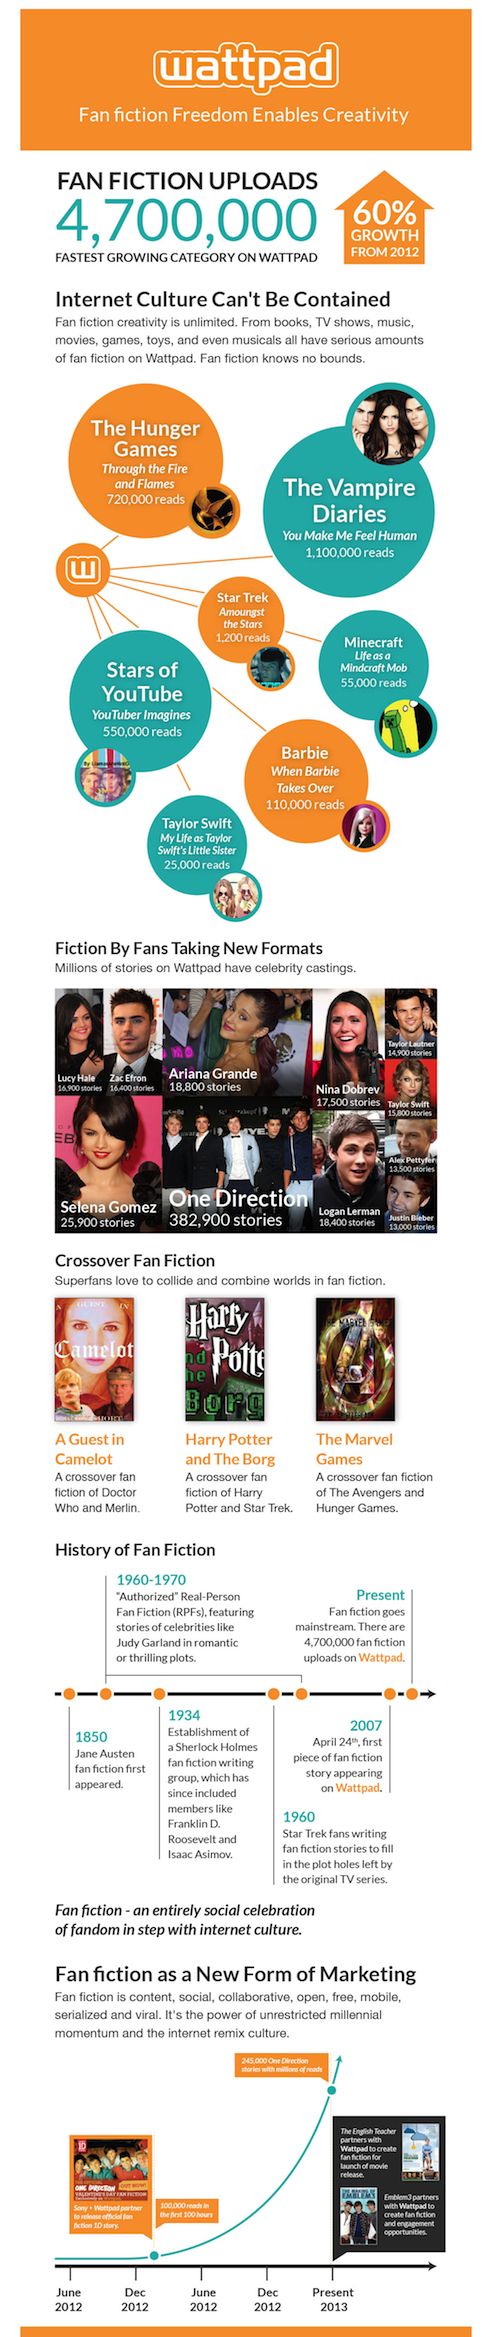 Wattpad-Fanfiction-Infographic1